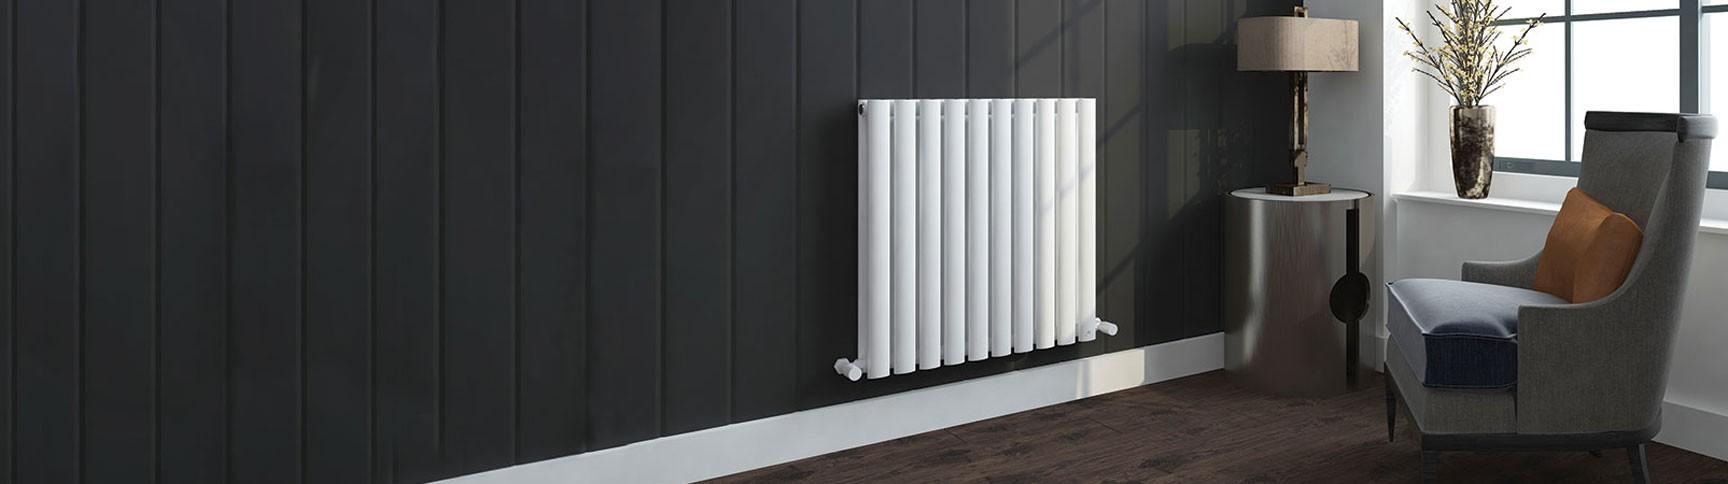 Radiators | Central Heating | Vertical Radiators | World of Tiles